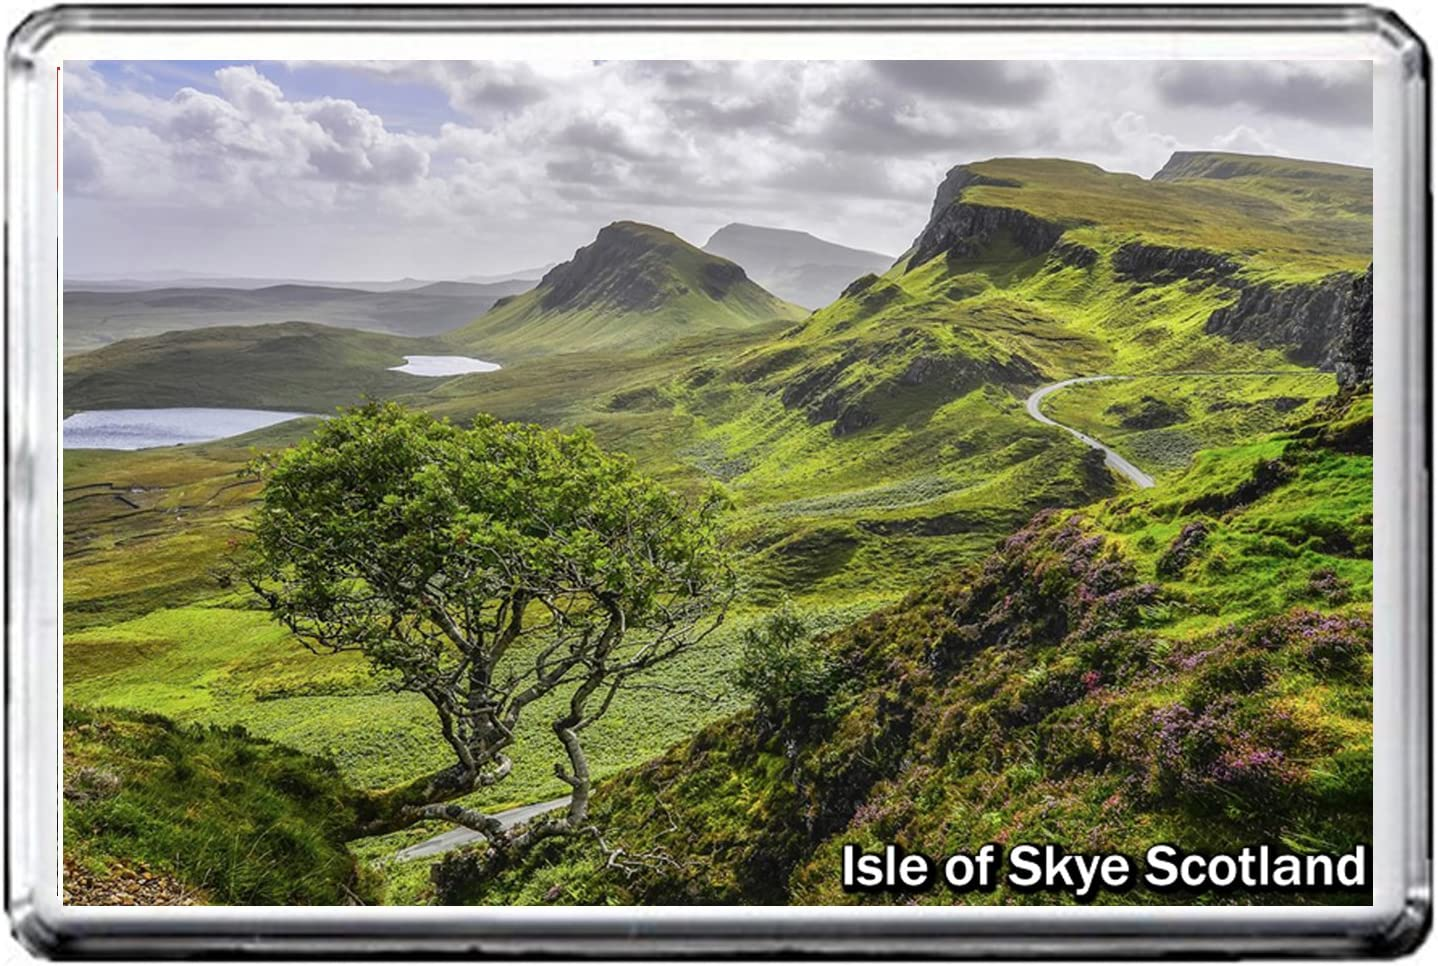 0257 ISLE of Skye Scotland Jumbo Photo Refrigerator Magnet Fridge Magnet United Kingdom Landmarks United Kingdom Attractions